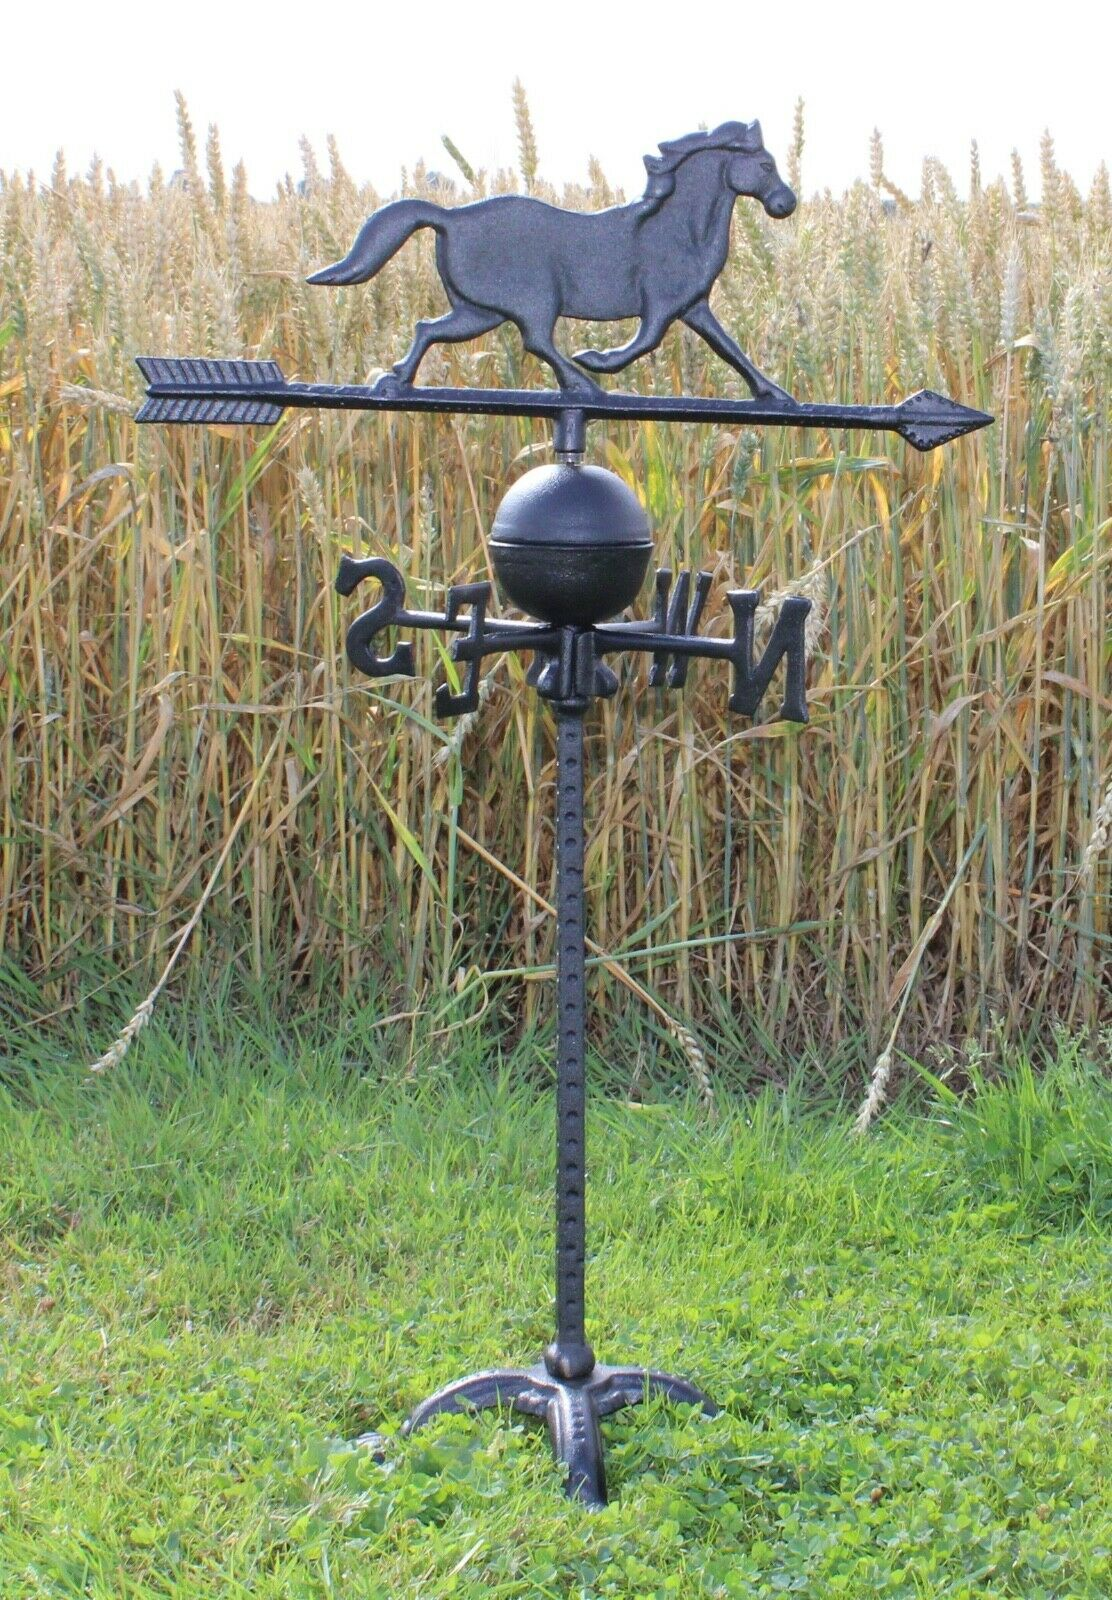 Garden Weather Vane Cast Iron Post Pole Rustic Rooster Horse Decor Freestanding